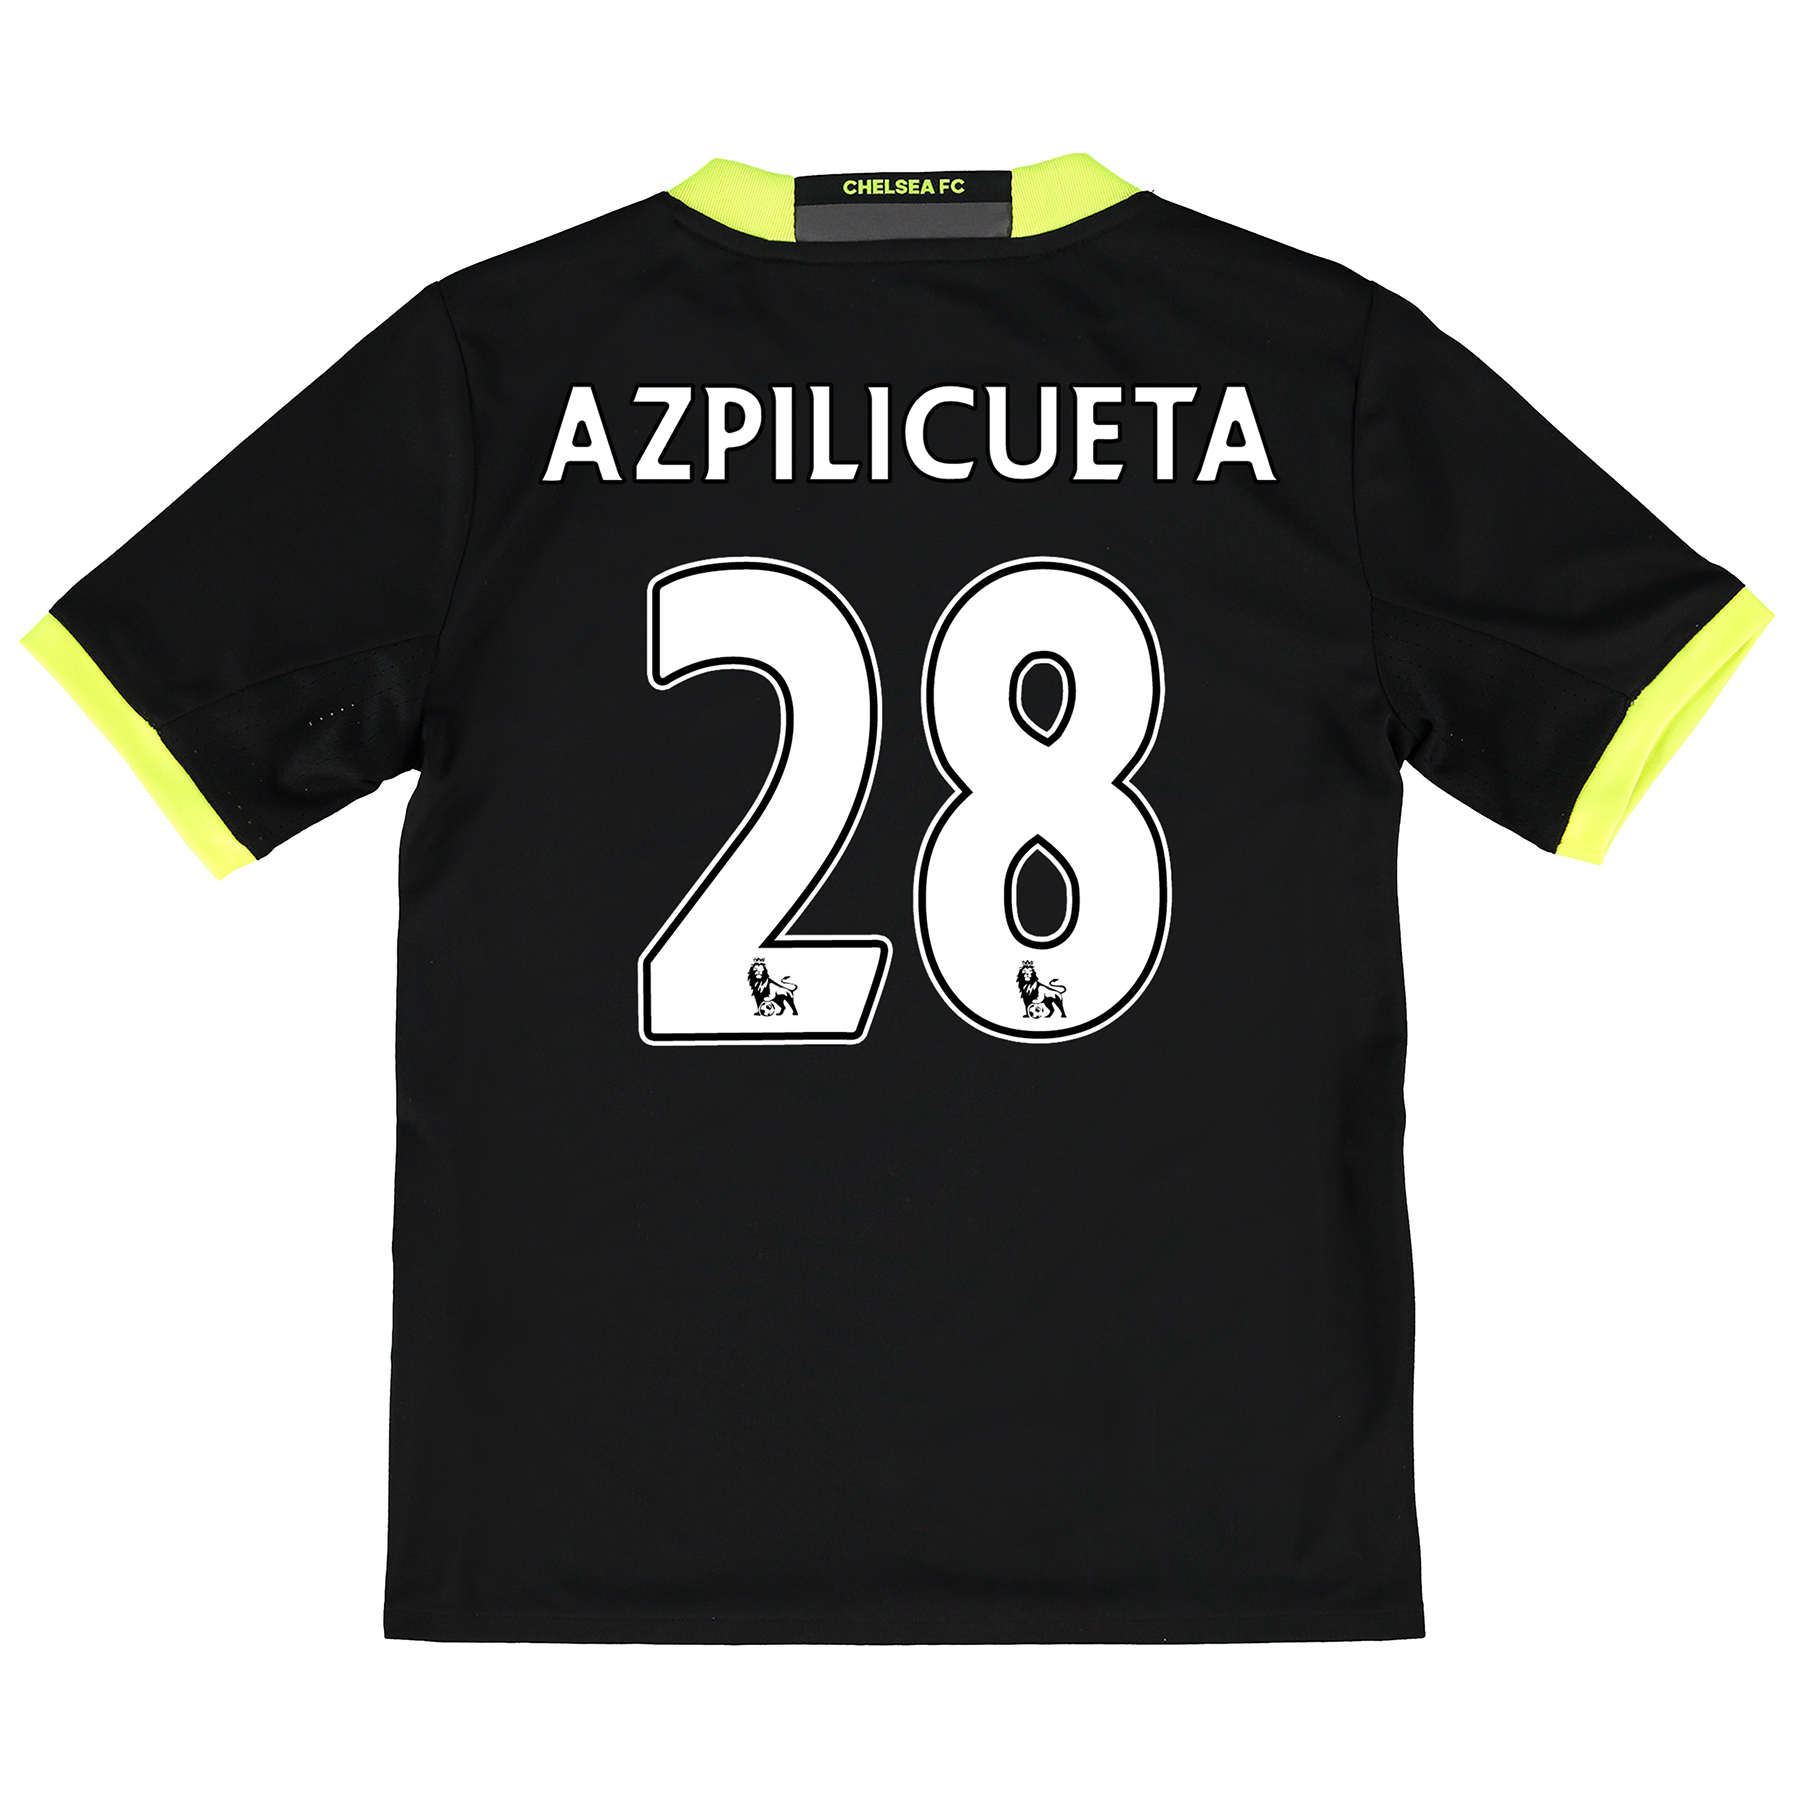 Chelsea Away Baby Kit 16-17 with Azpilicueta 28 printing